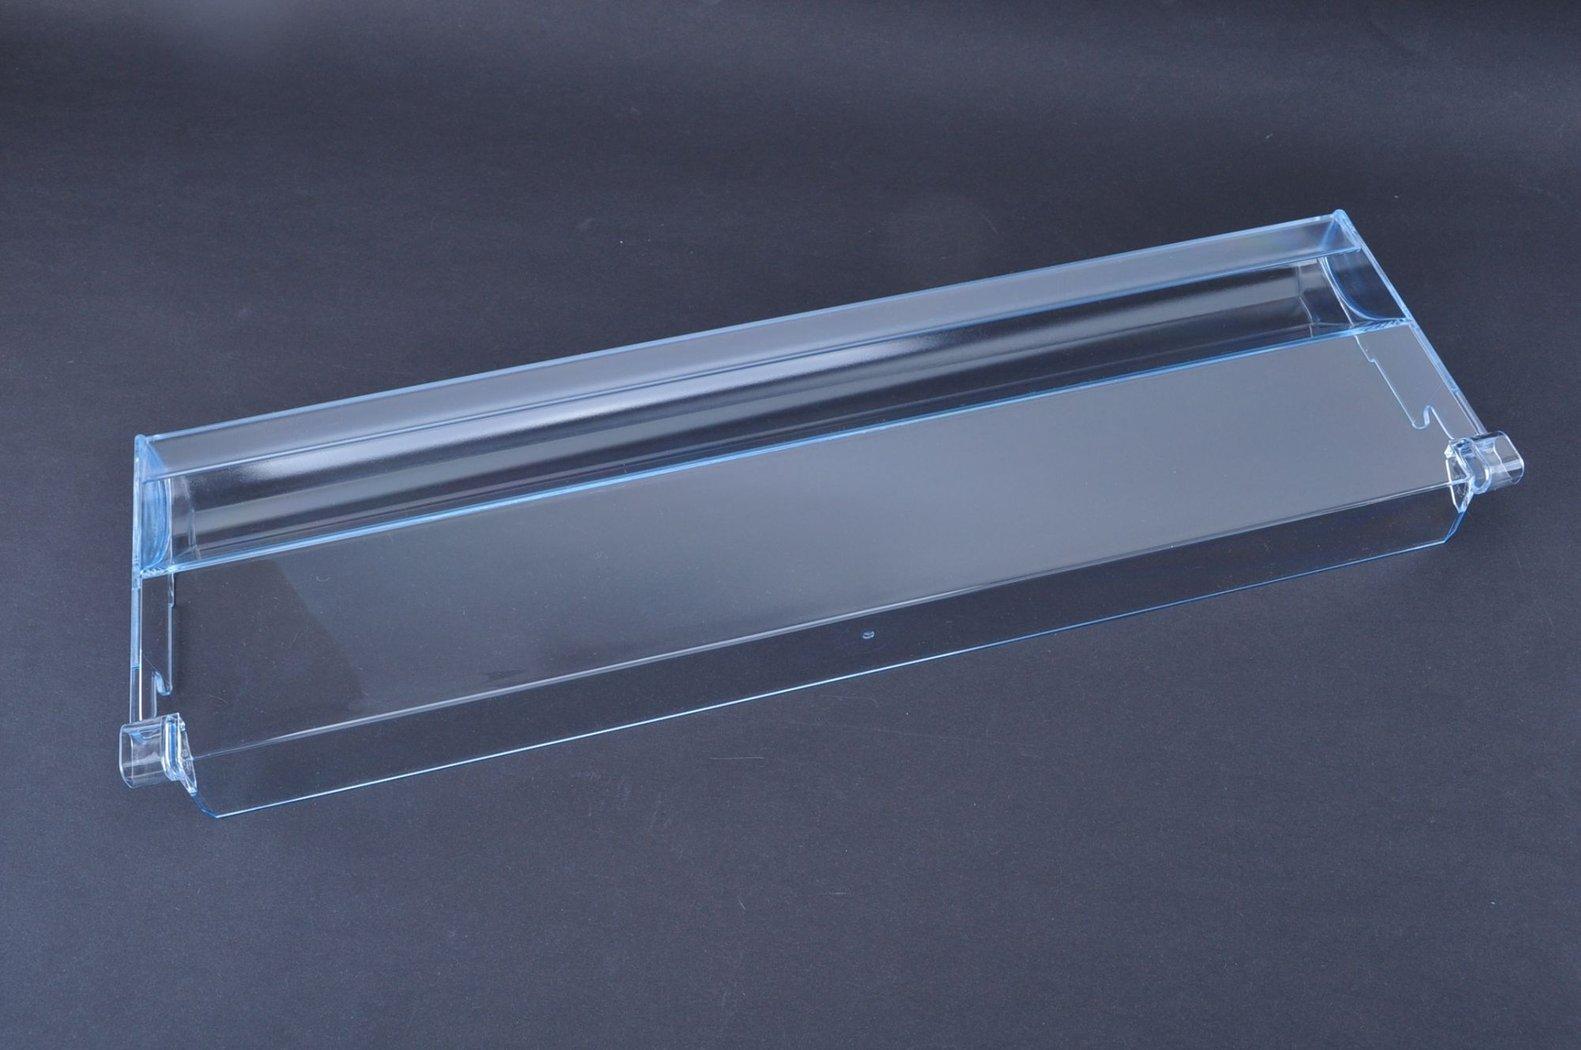 Bosch Kühlschrank Ersatzteile Schweiz : Kühlschrank ersatzteile schublade schublade 425x220x210mm siemens